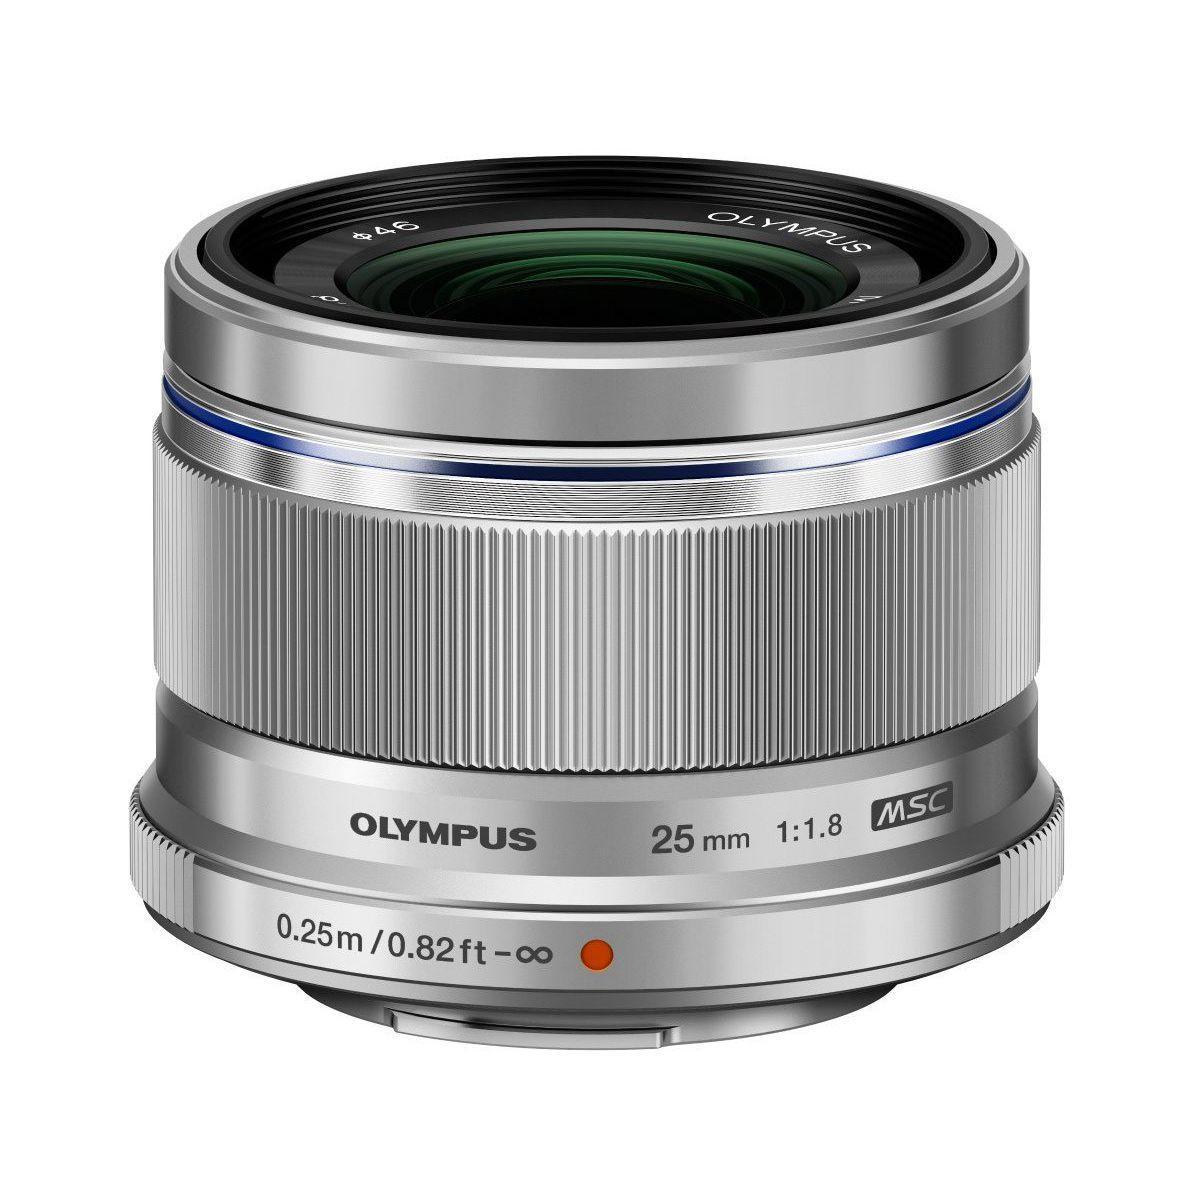 Objectif olympus 25mm 1:1.8 silver m.zuiko digital